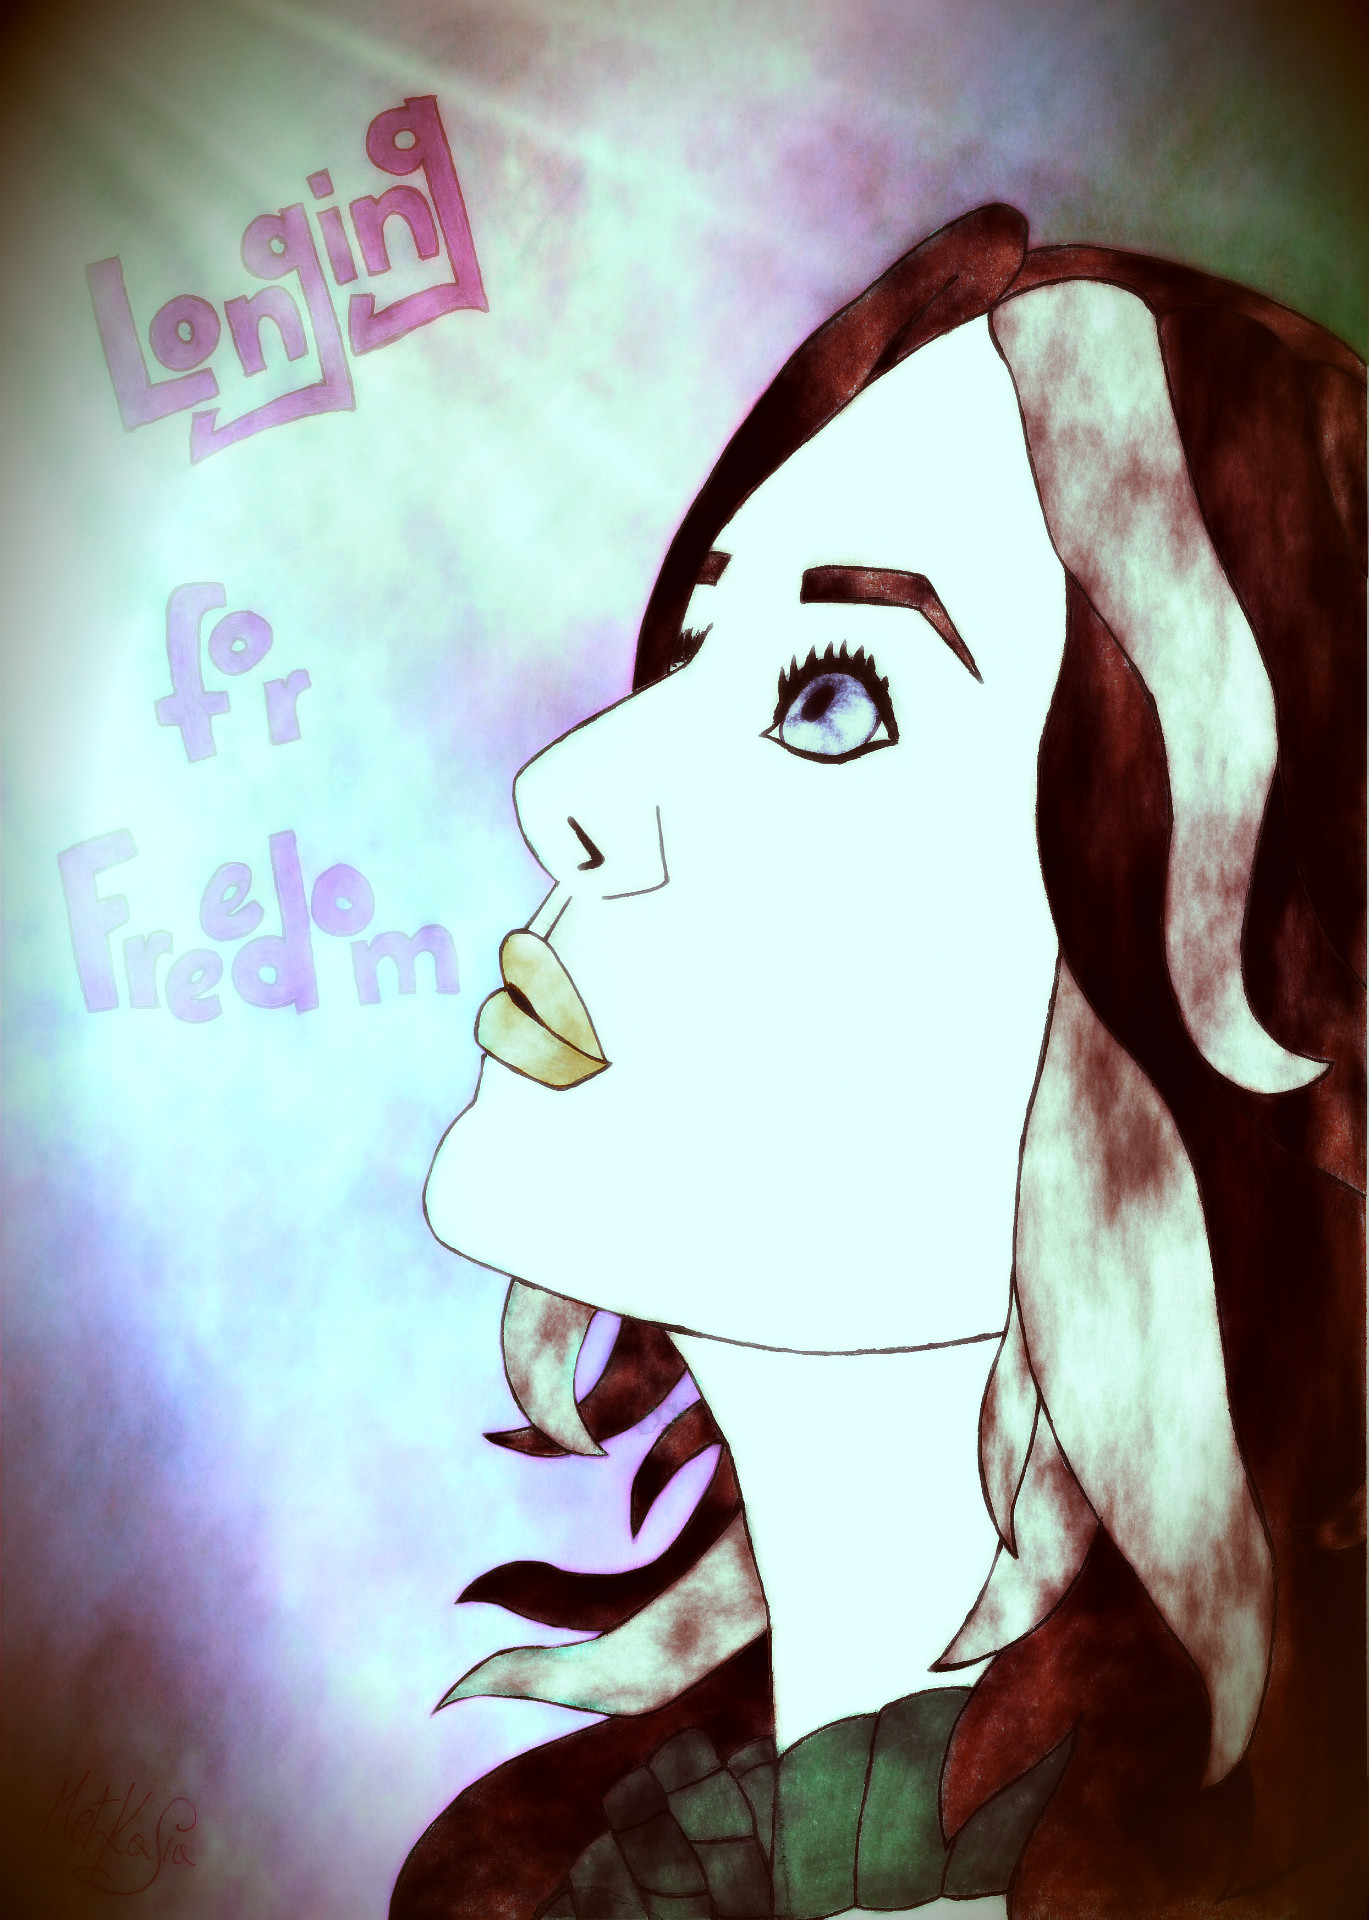 Kasia michalak longing for freedom99